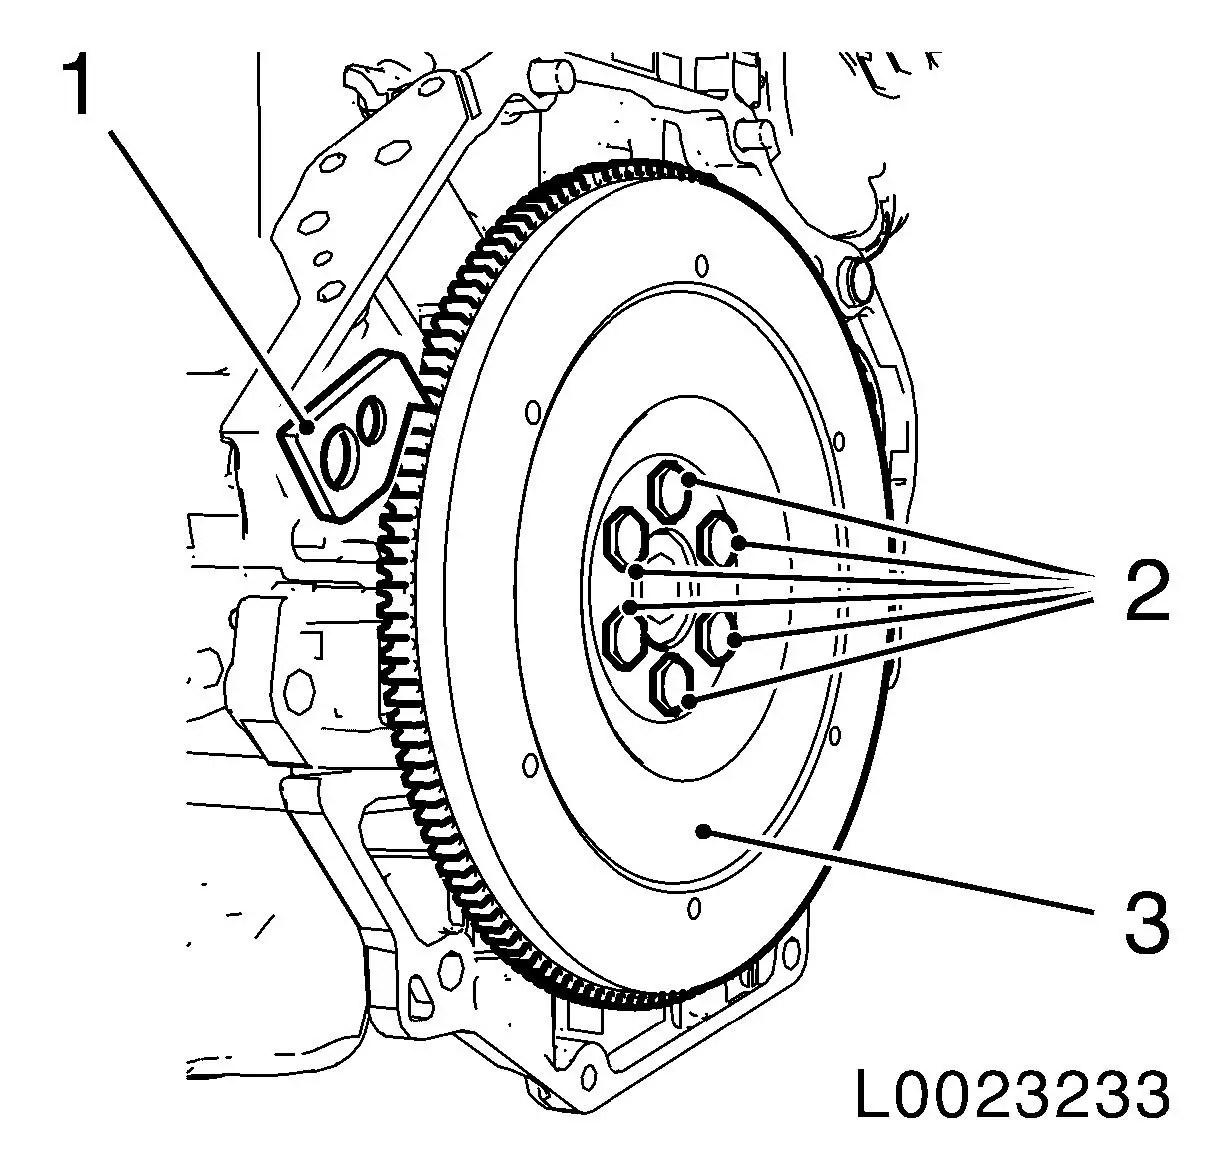 Vauxhall Workshop Manuals Gt Corsa D Gt J Engine And Engine